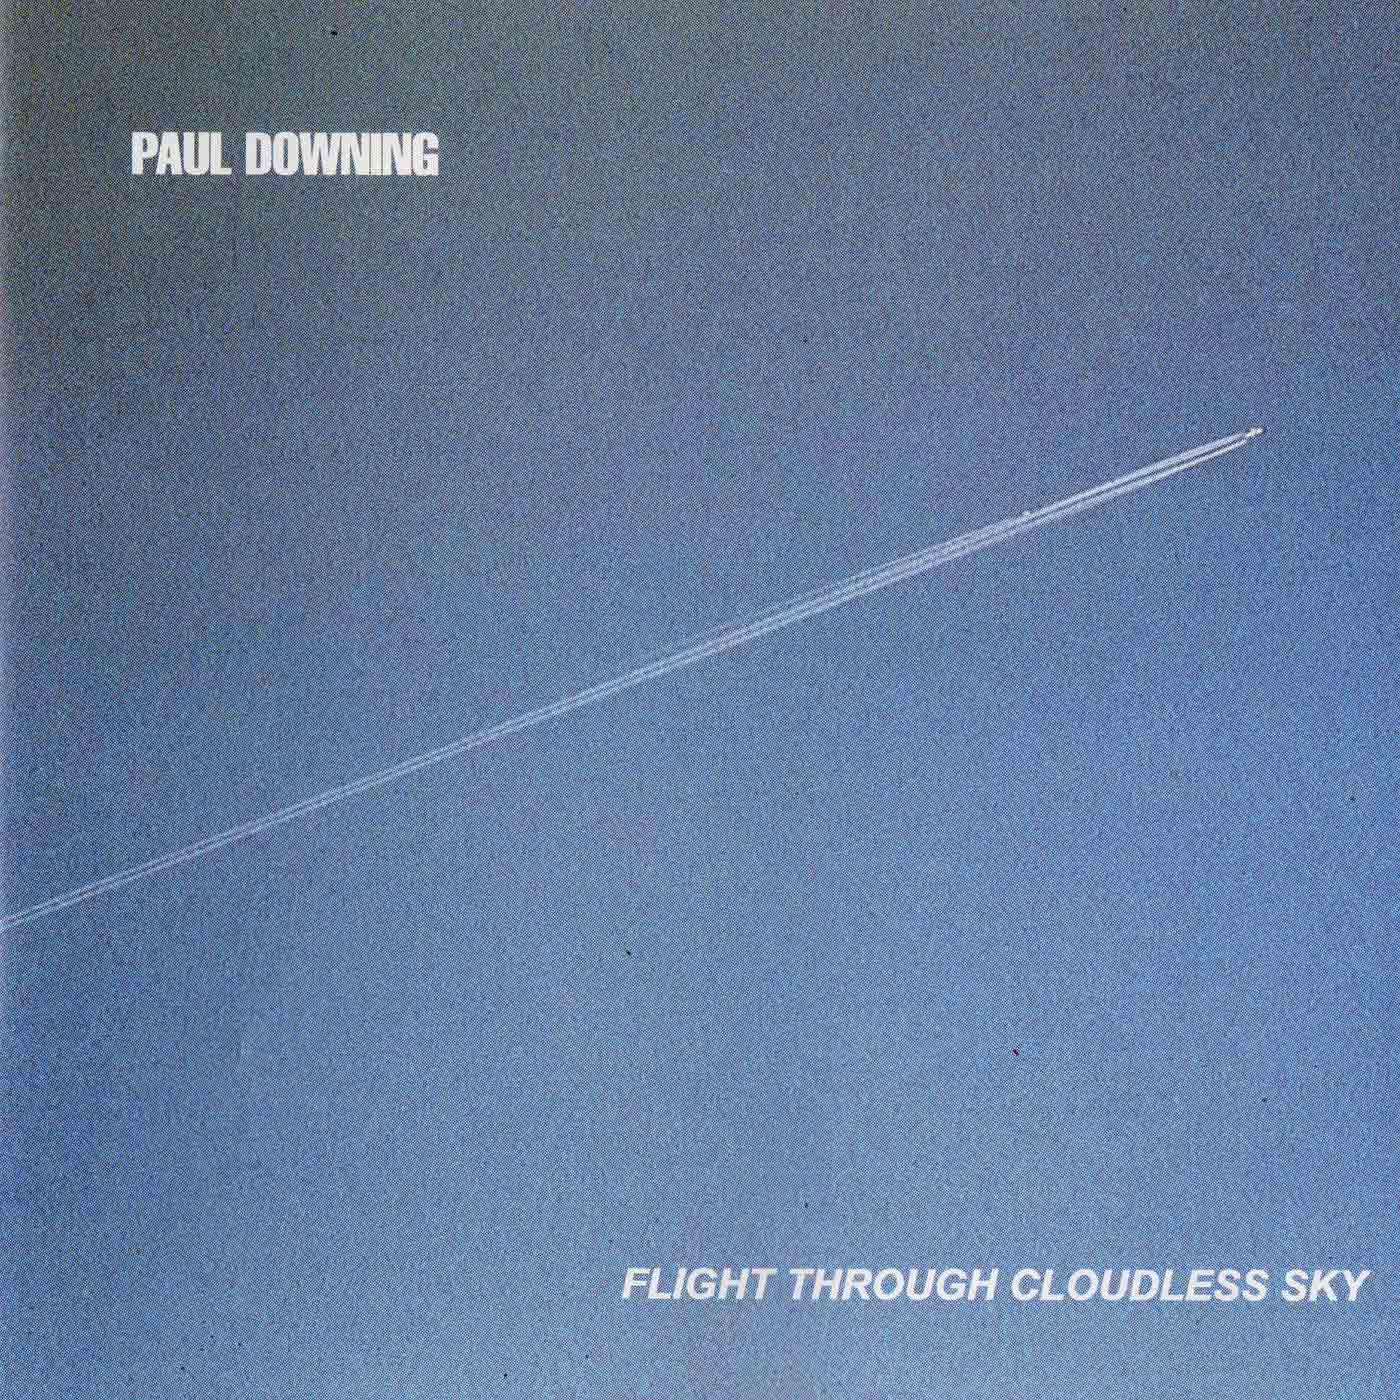 flight-through-cloudless-crop_1400-lo